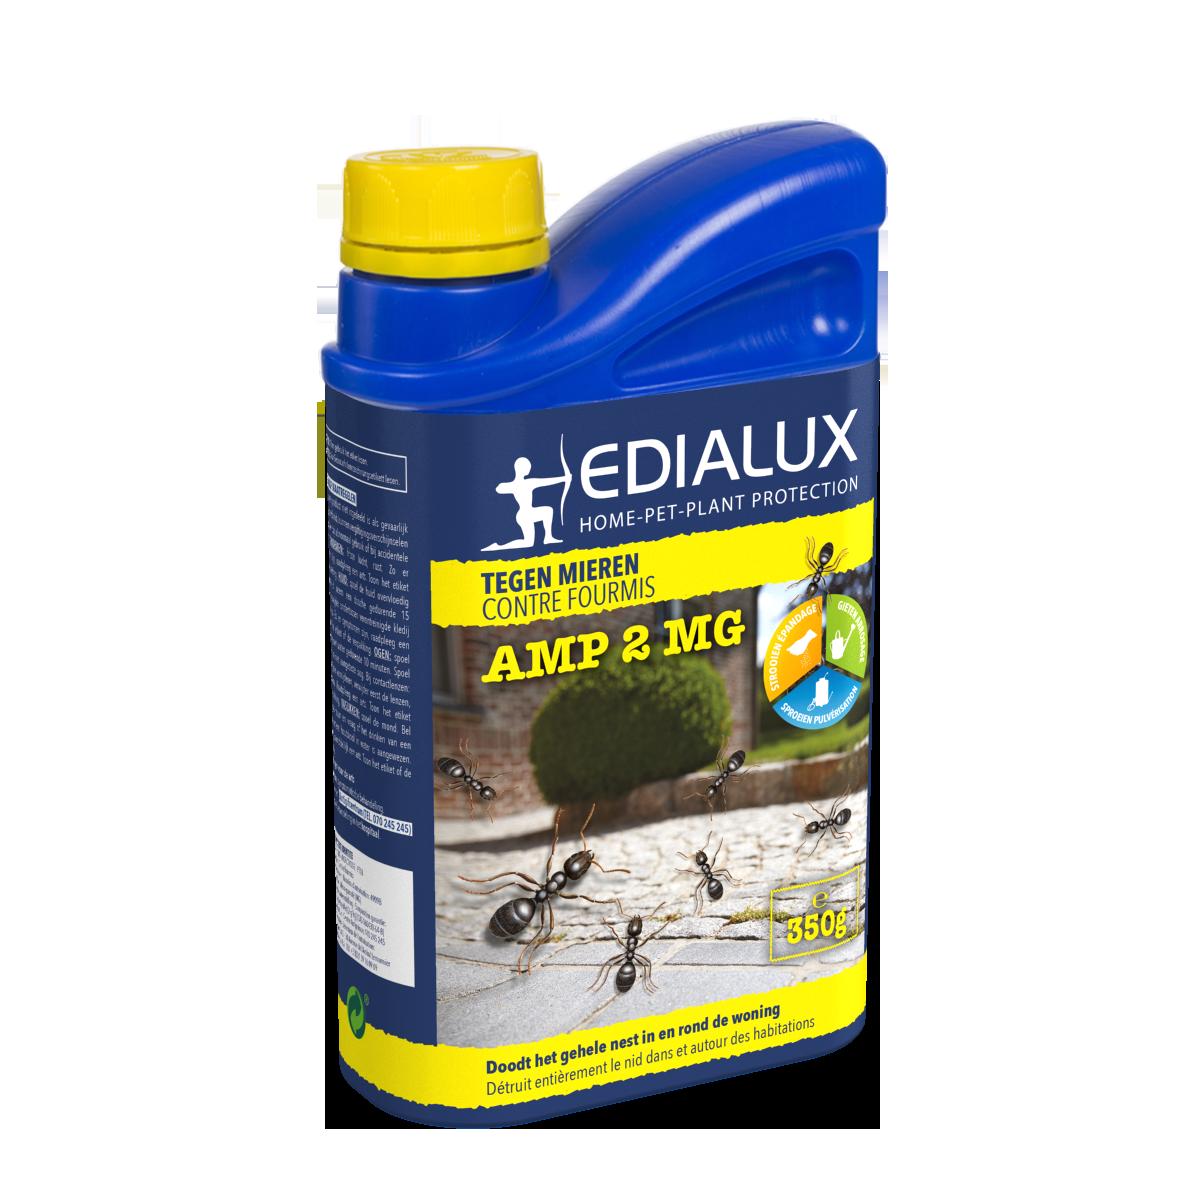 AMP 350gr - Zeer sterk mierenproduct dat tot 100 nesten doodt!